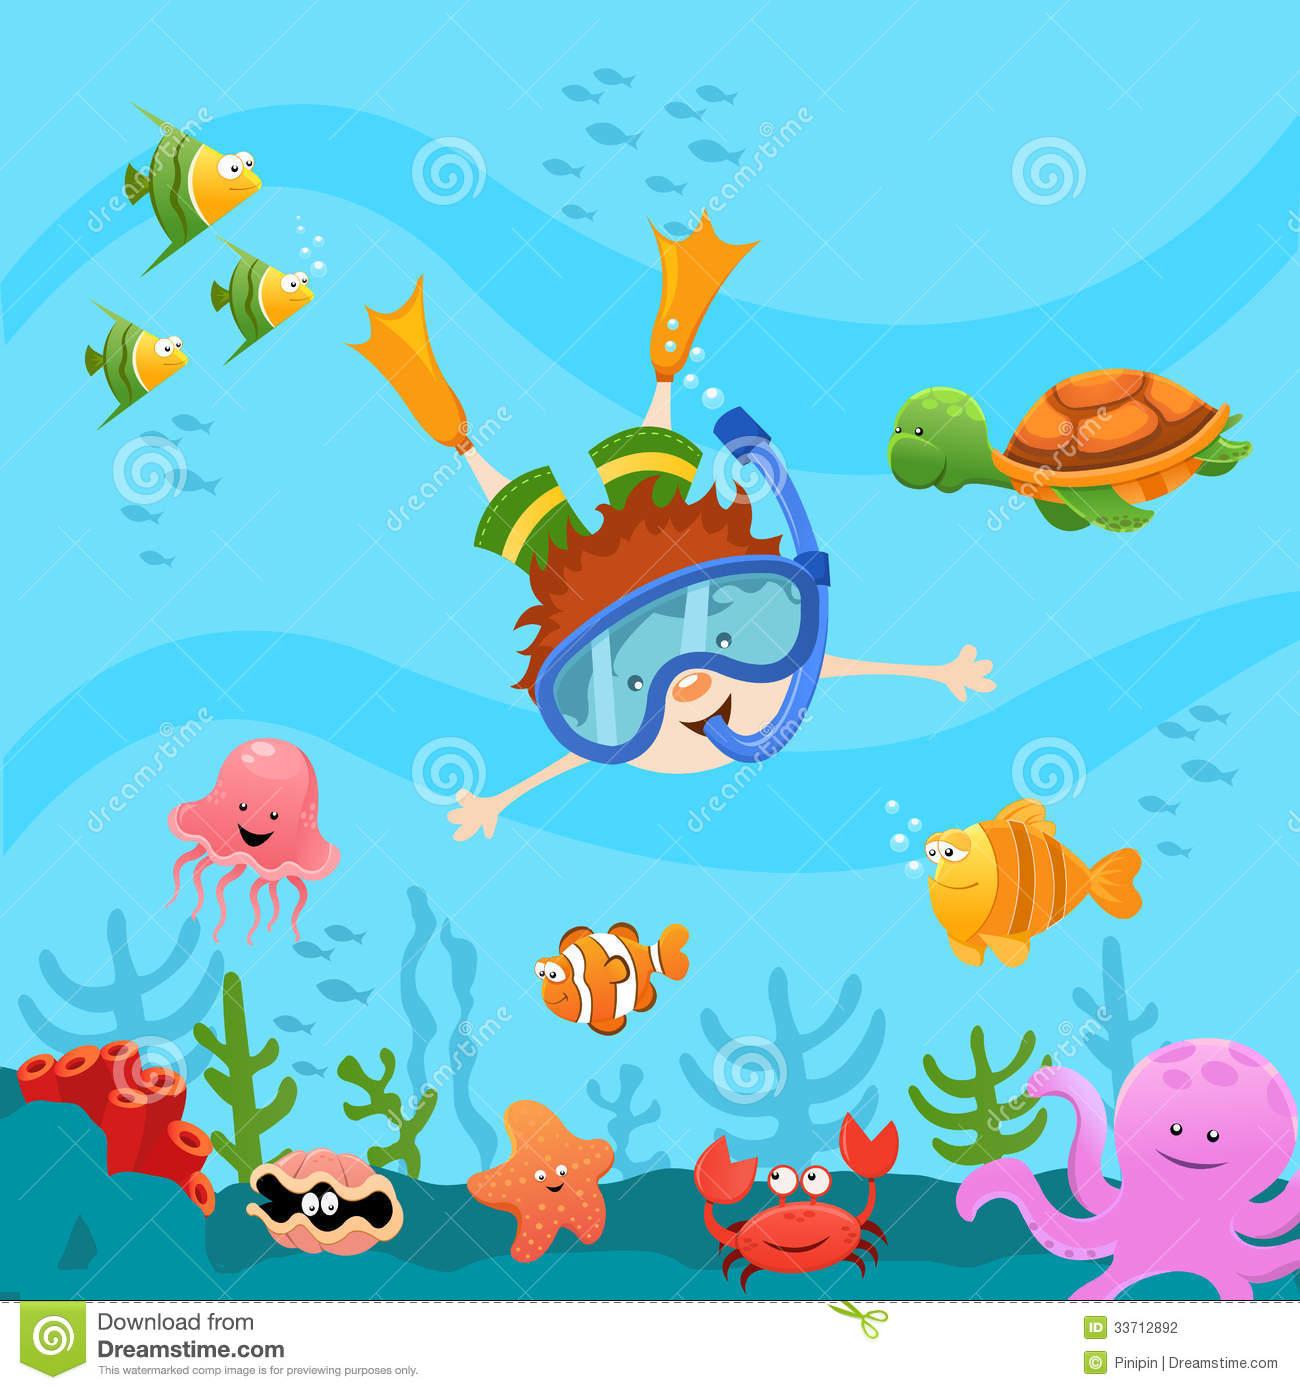 Clipart Ocean And Explore The Ocean